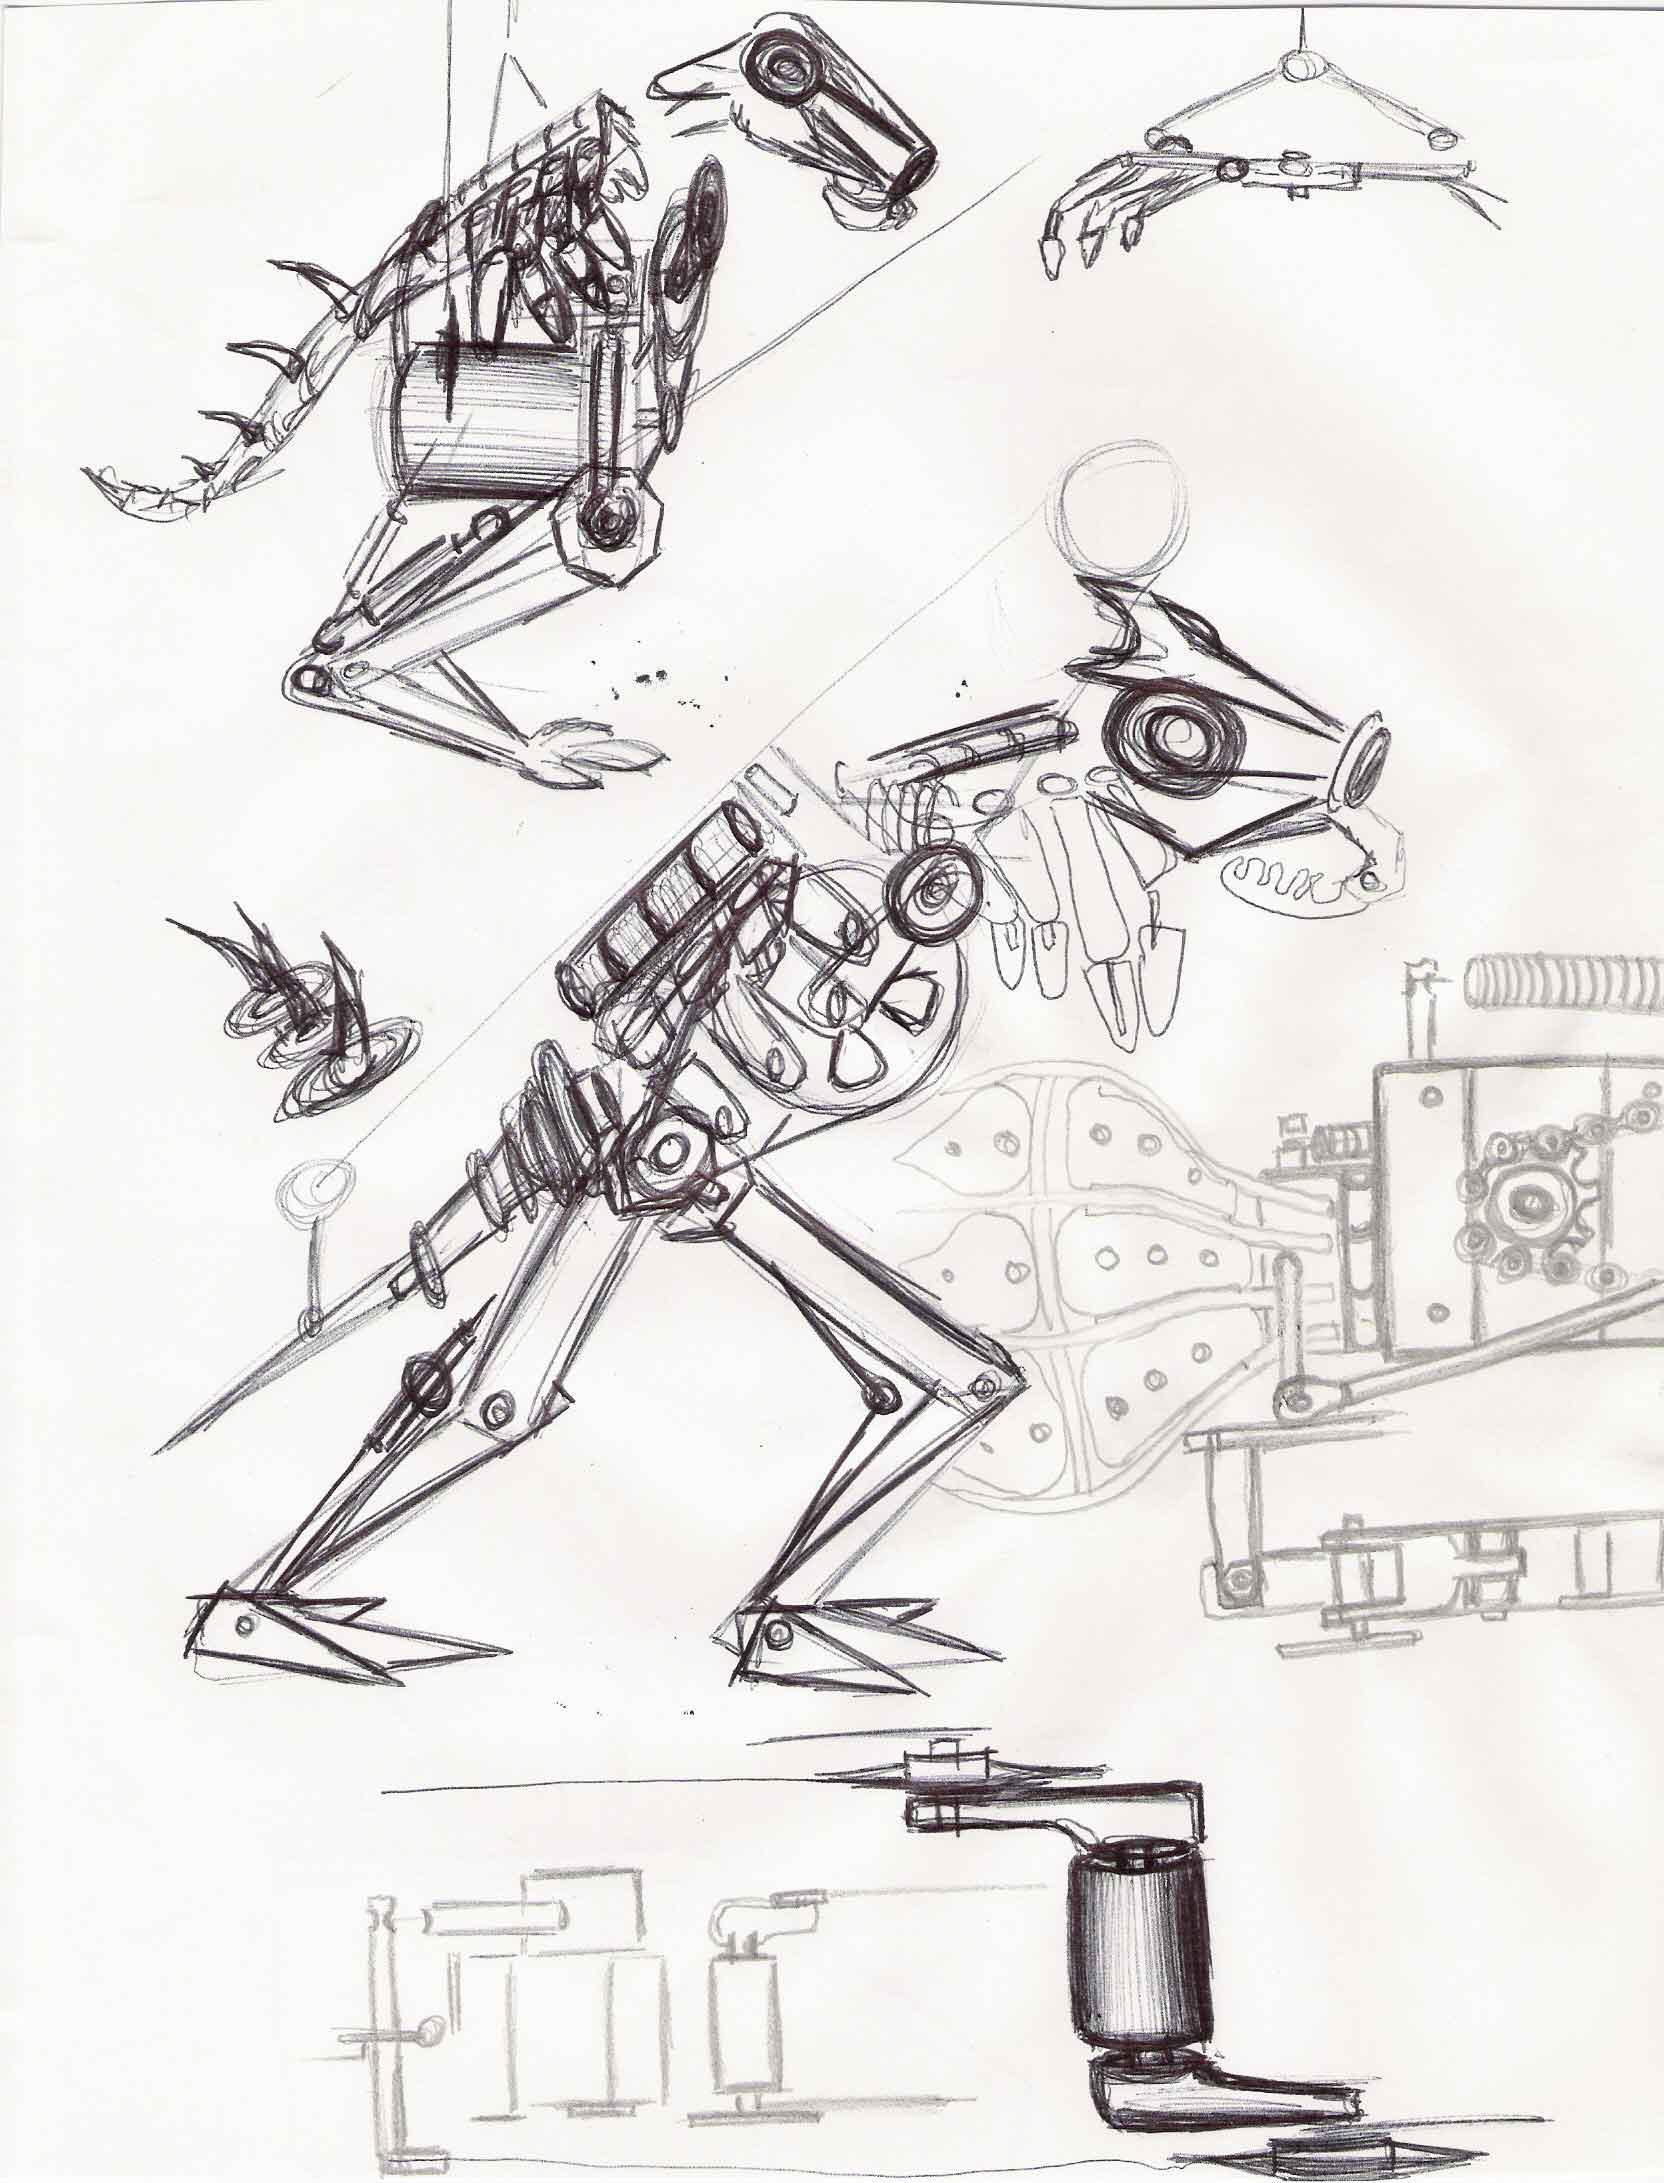 sketch-24-sept-05.jpg